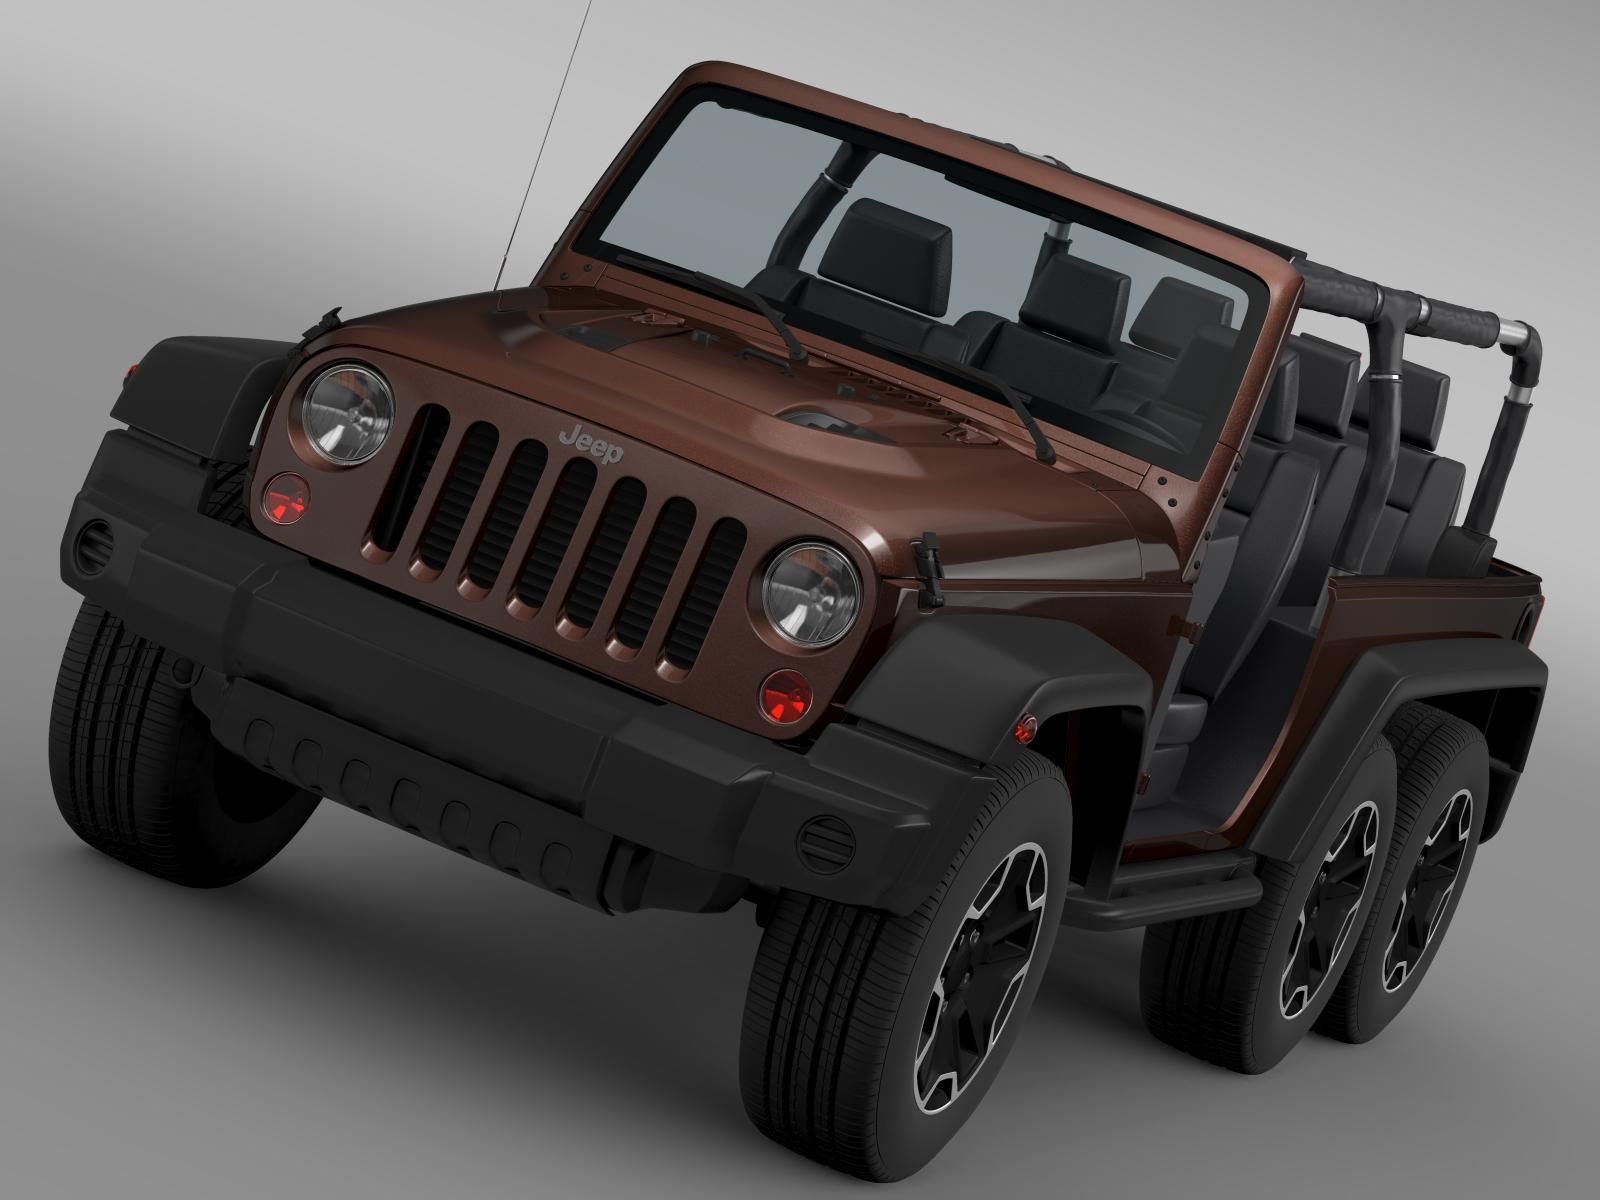 jeep wrangler rubicon 6×6 2016 3d model 3ds max fbx c4d lwo ma mb hrc xsi obj 212112